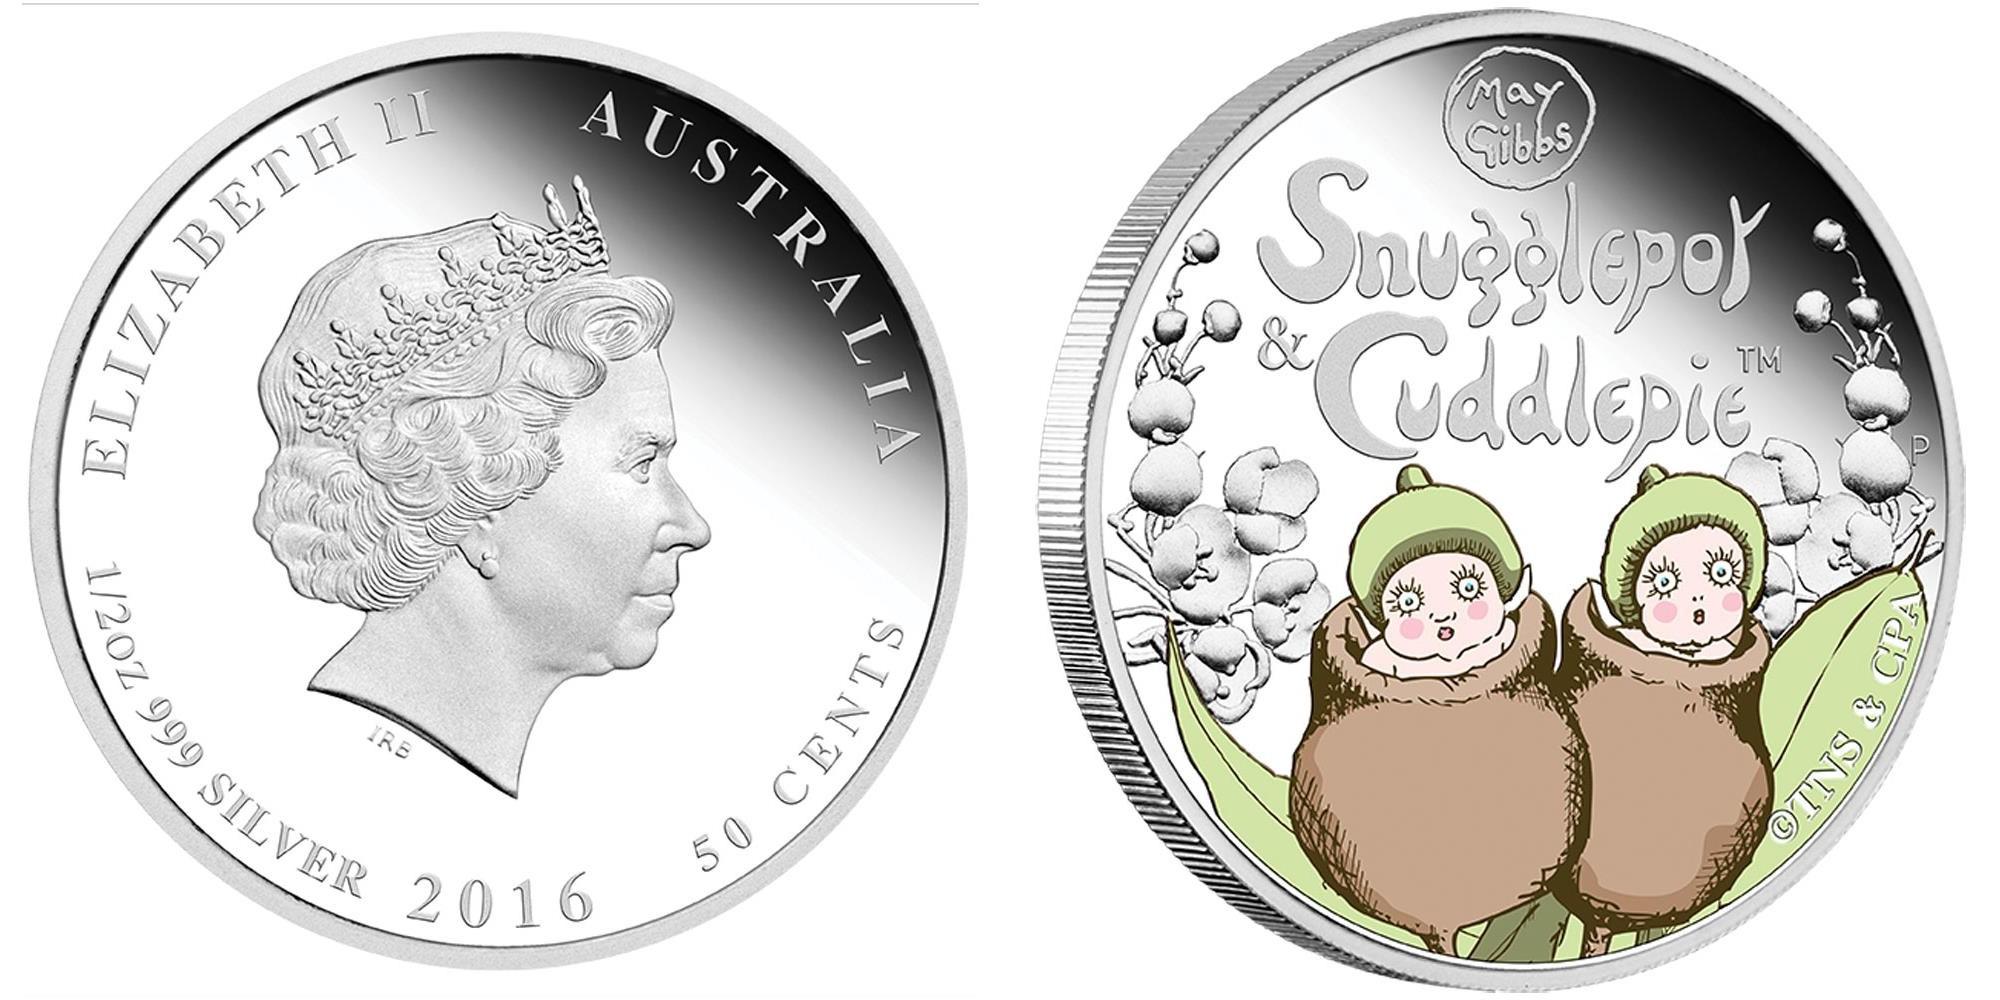 australie 2016 snugglepot & cuddlepie